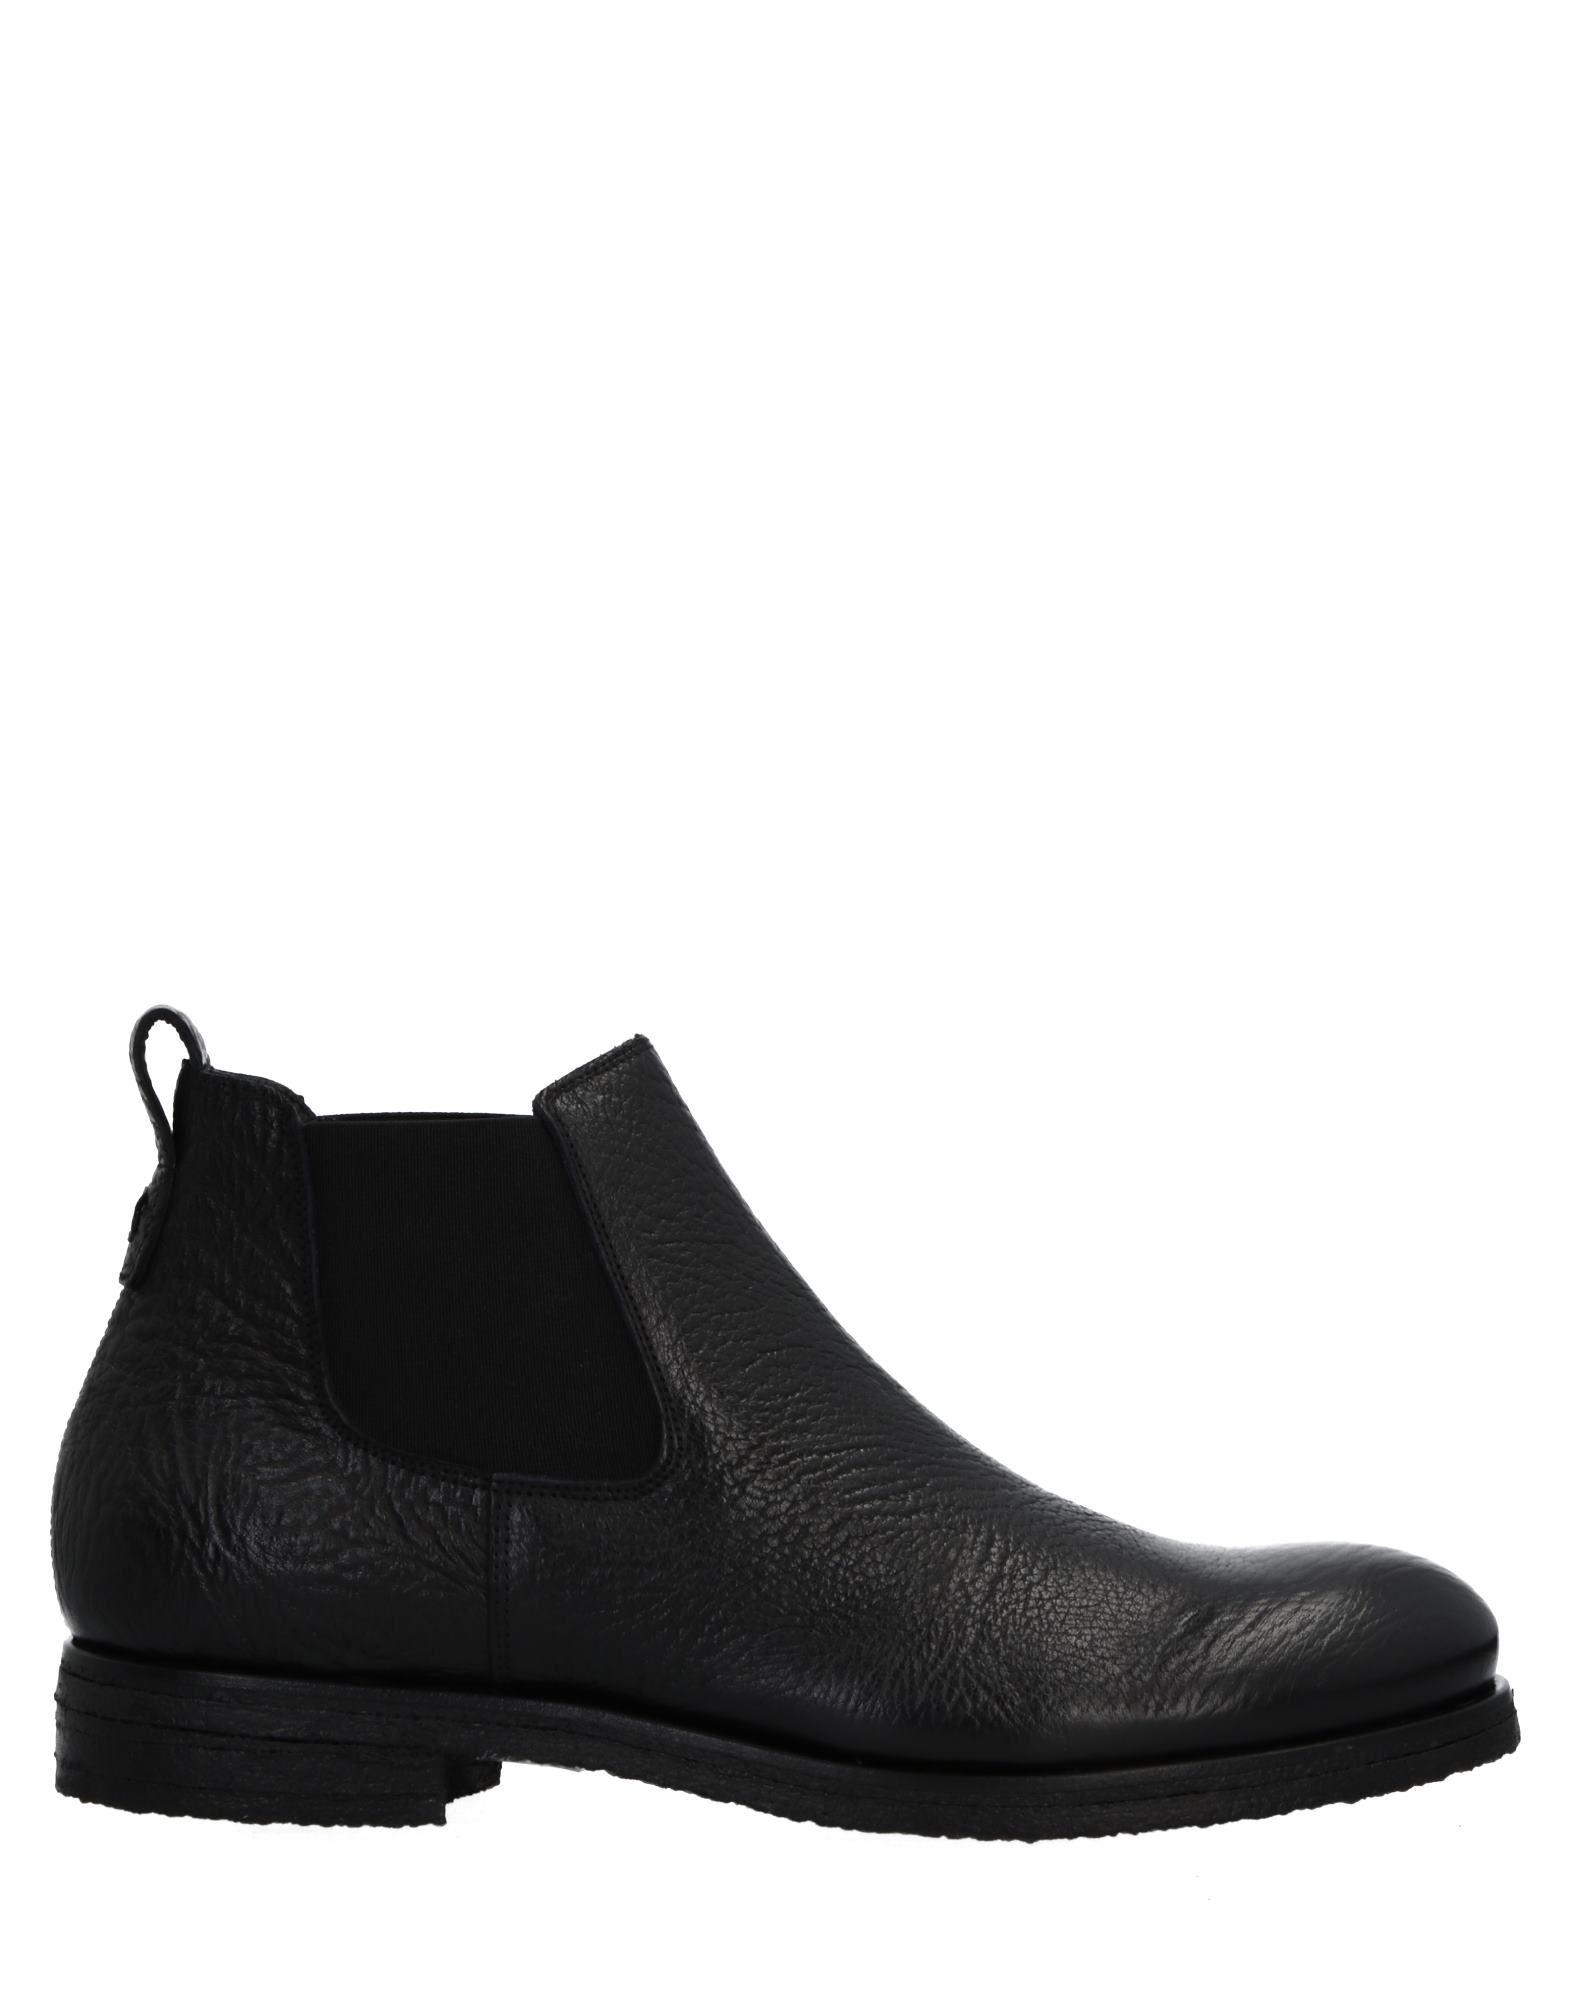 Raparo 11517613UJ Stiefelette Herren  11517613UJ Raparo Gute Qualität beliebte Schuhe efb7fb